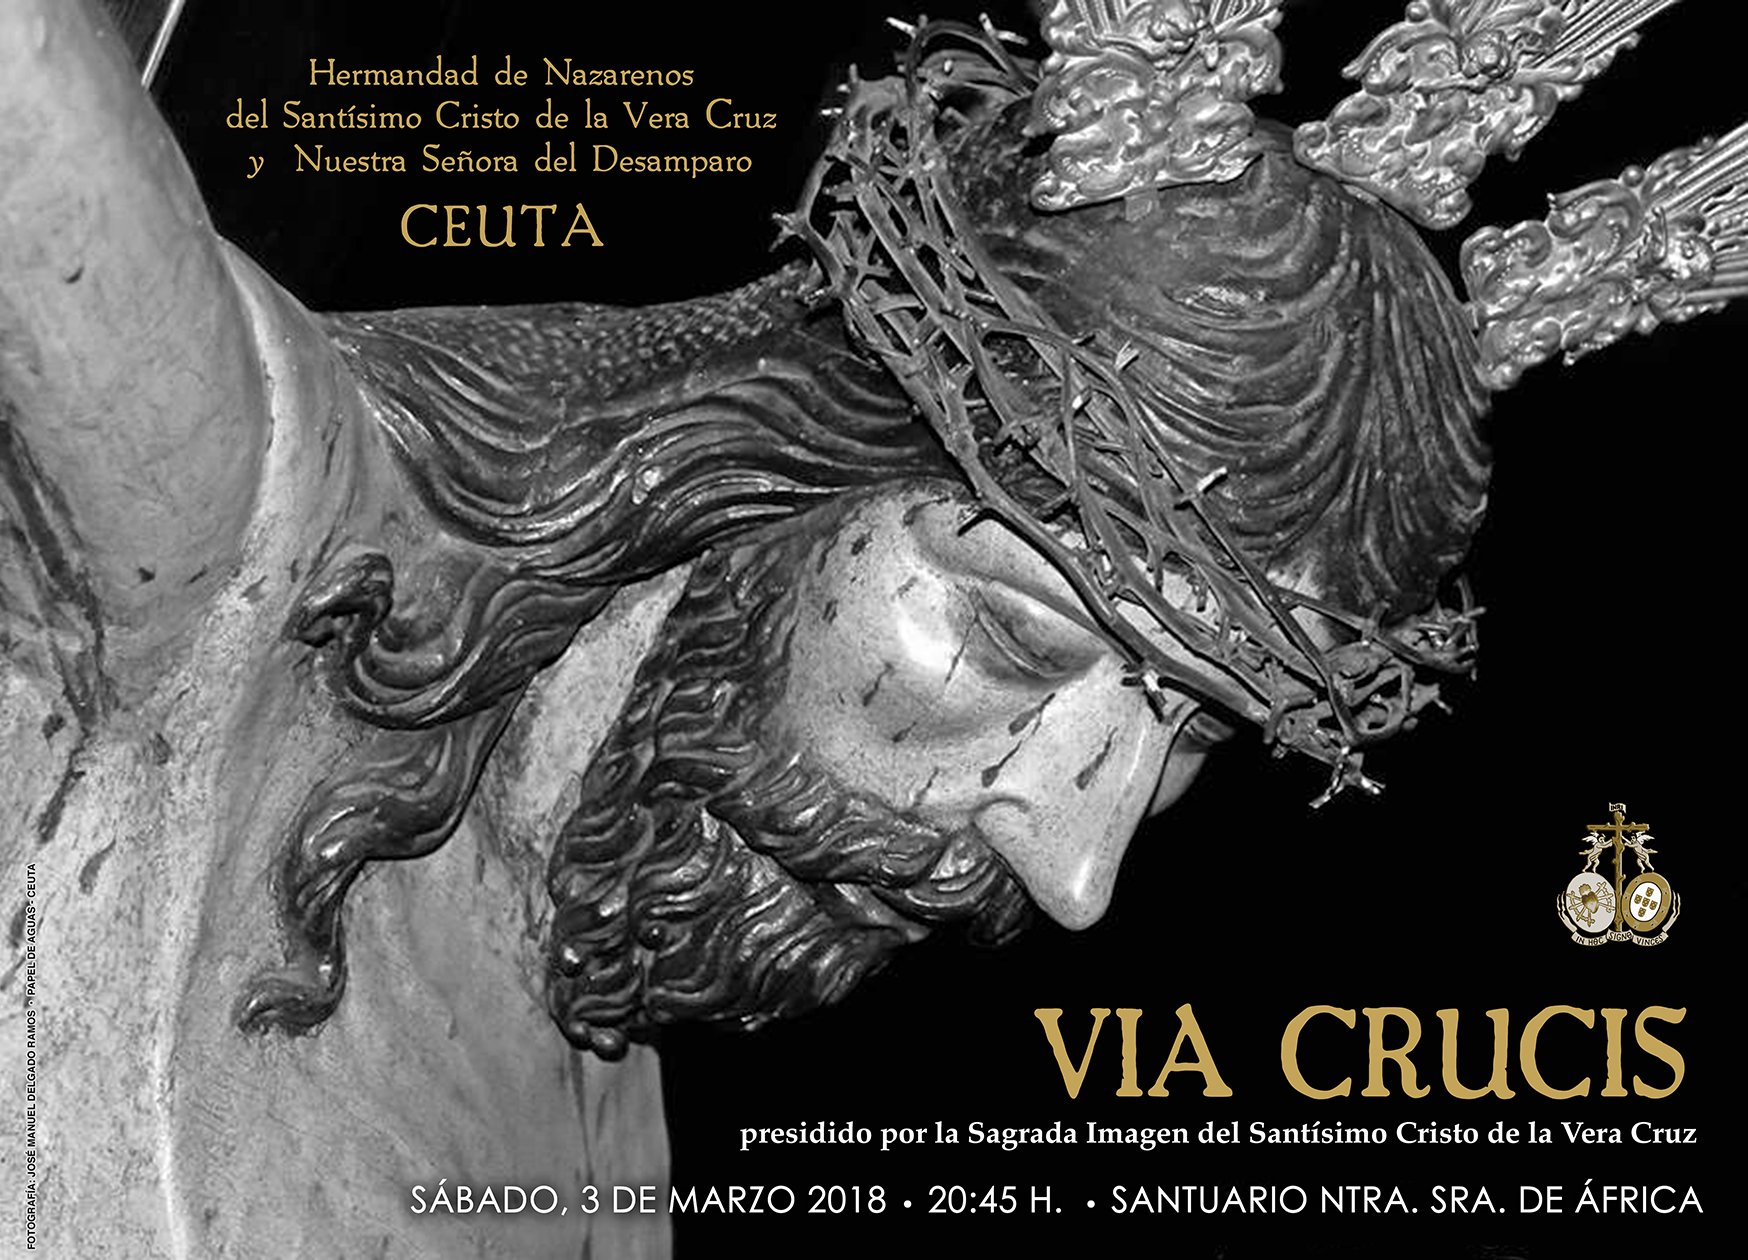 Cartel Vía Crucis 2018